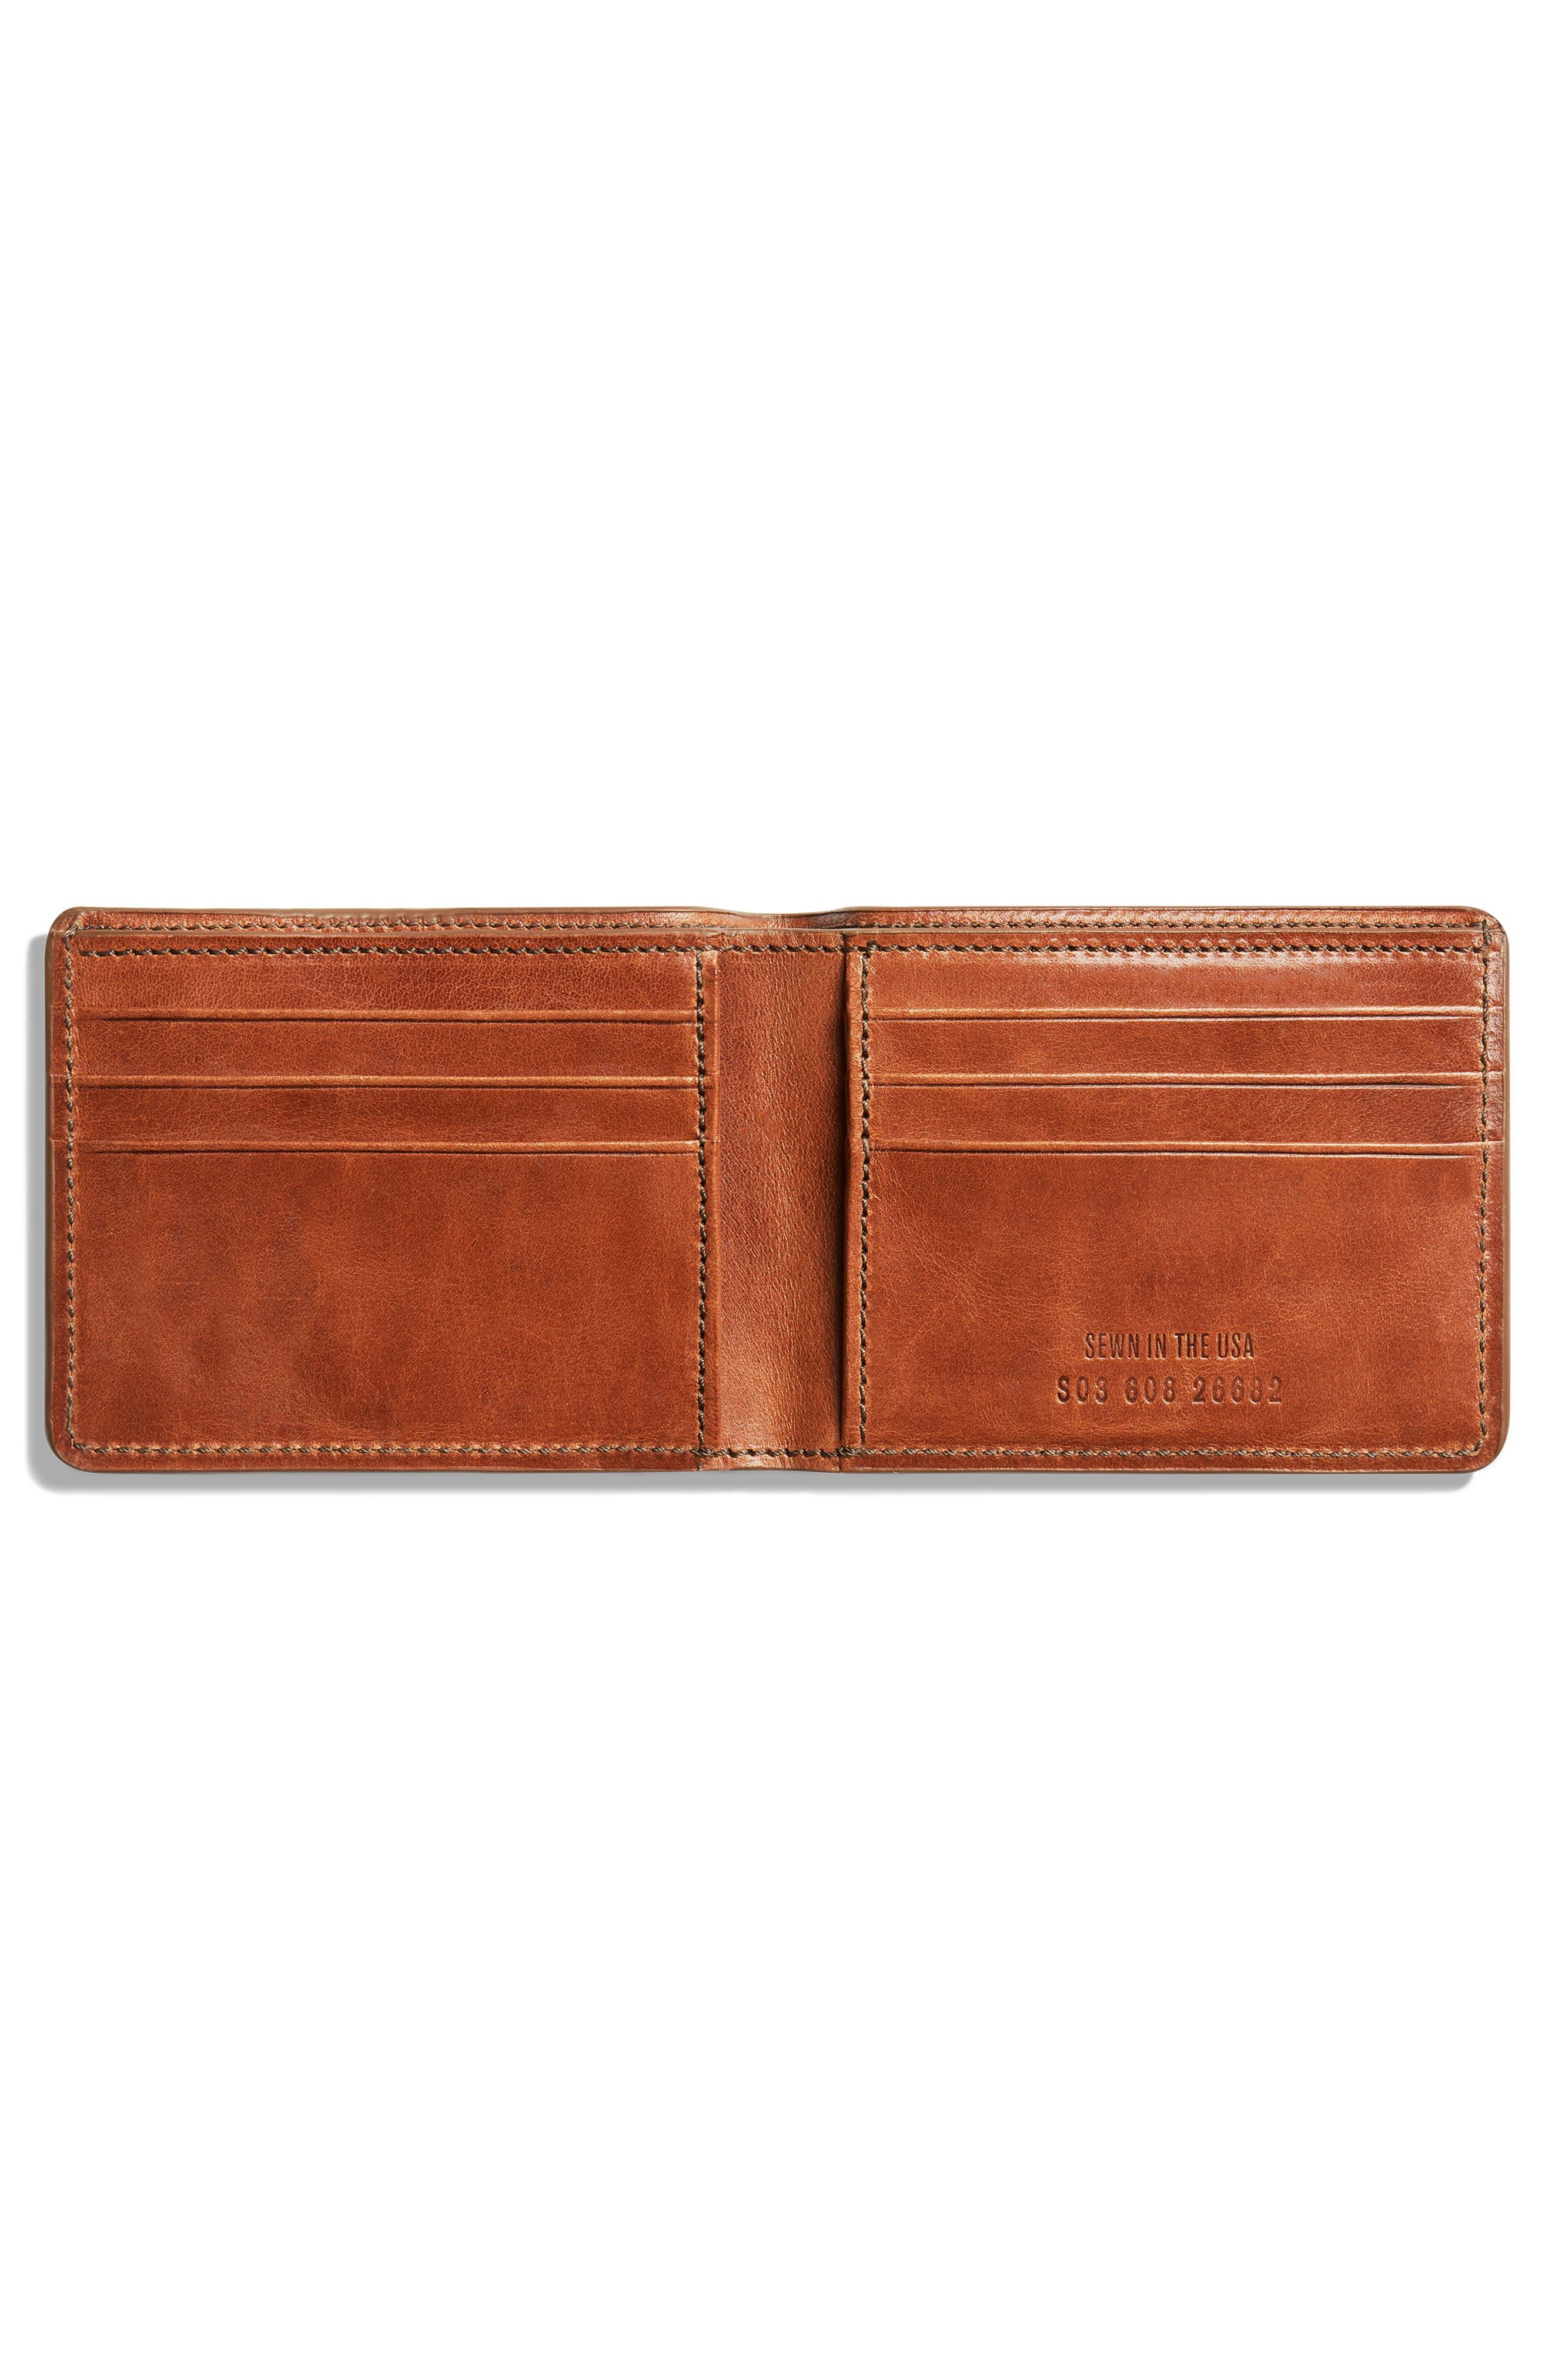 SHINOLA, Harness Slim 2.0 Bifold Leather Wallet, Alternate thumbnail 2, color, BOURBON